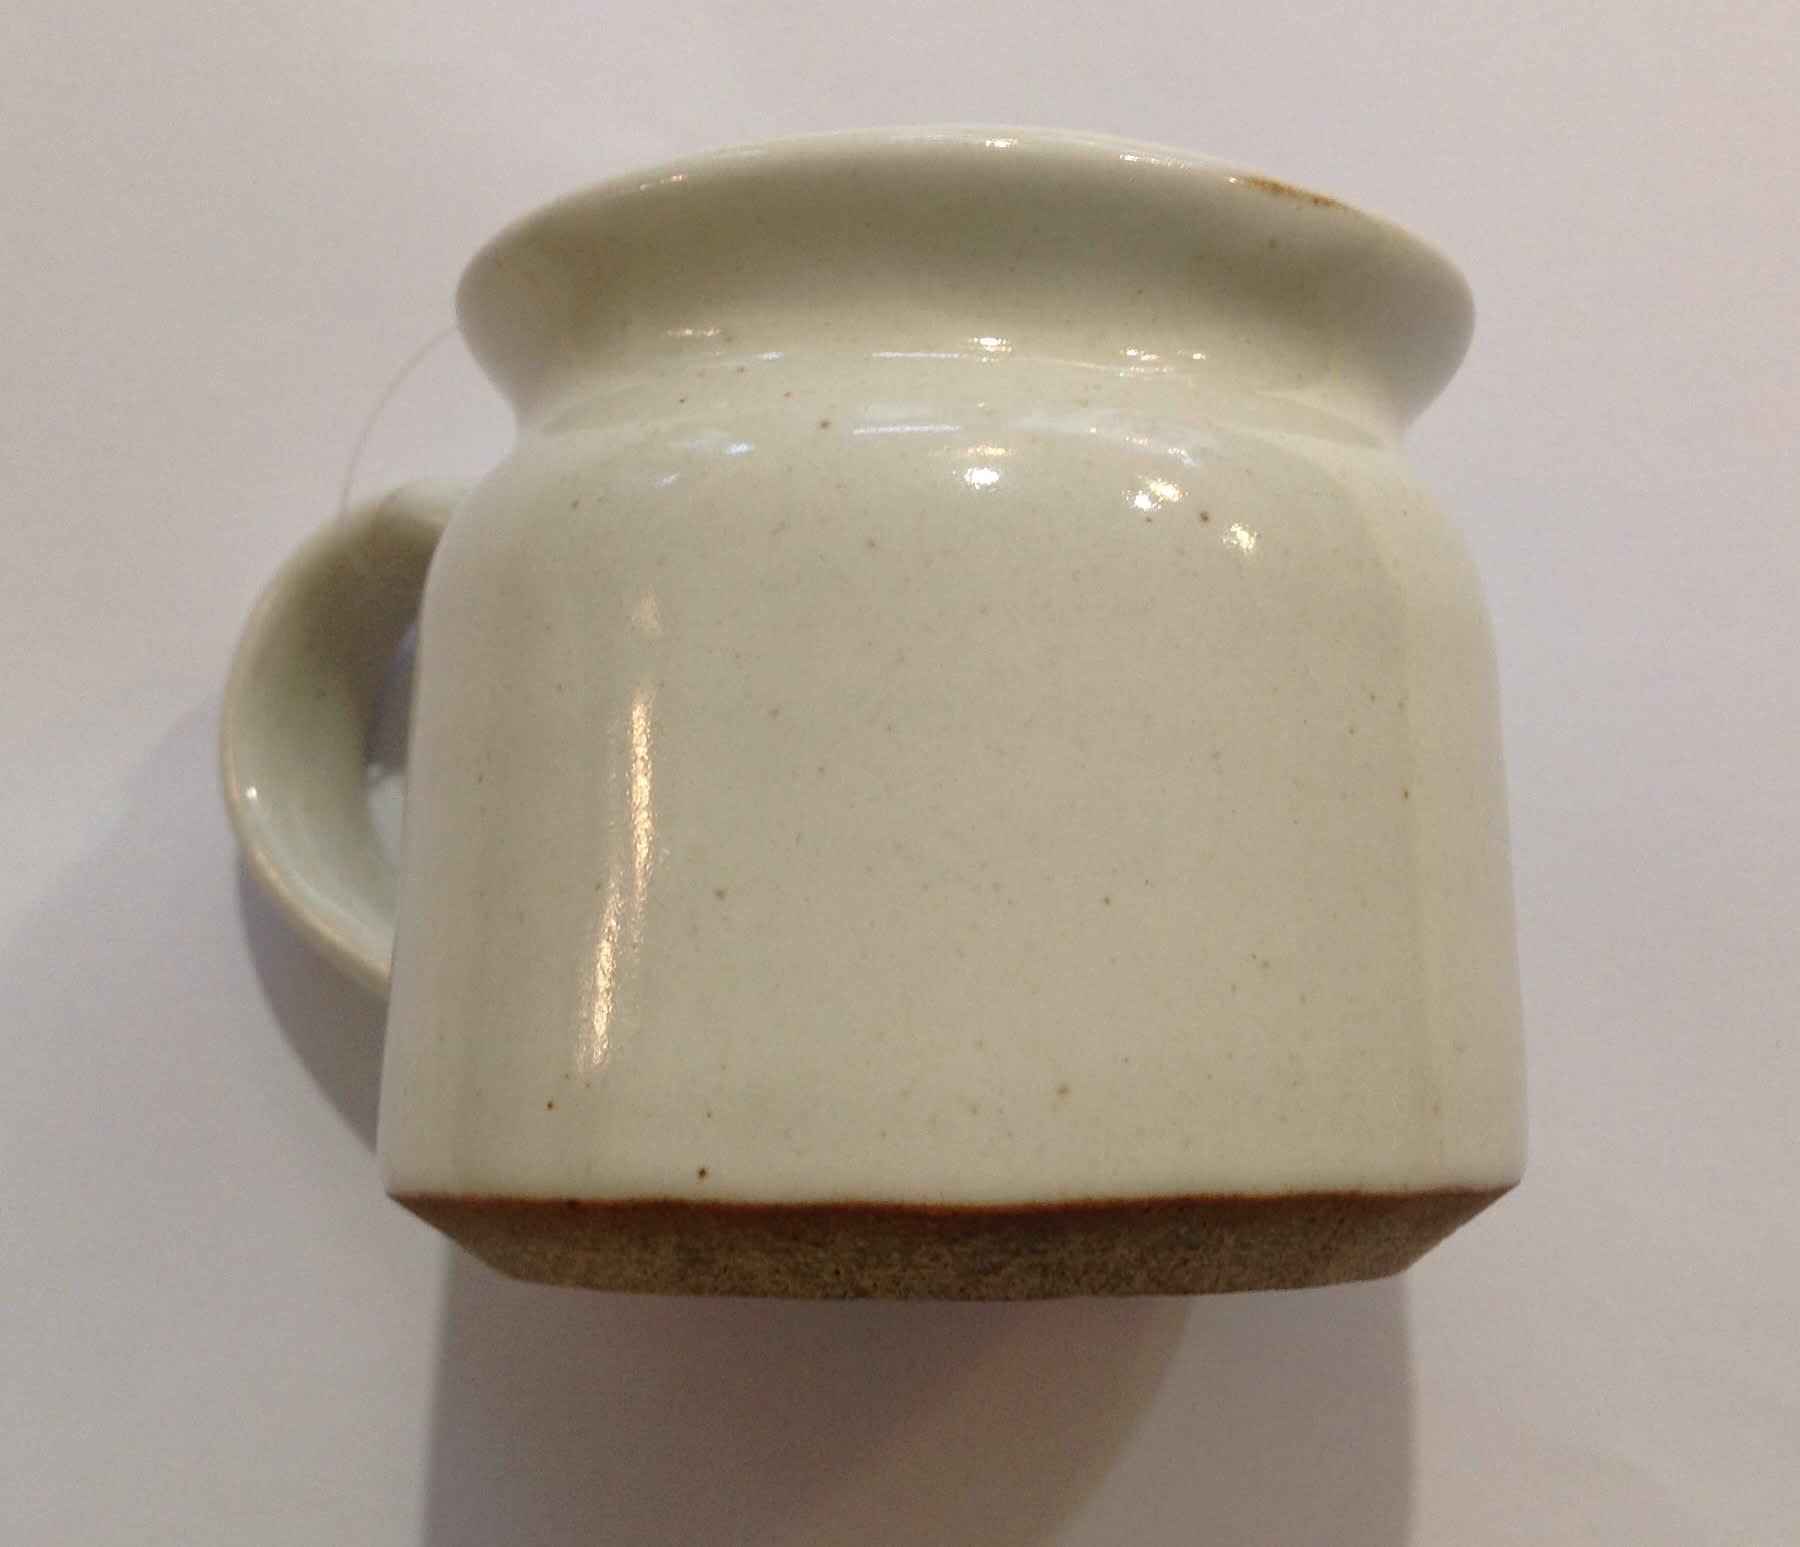 New Overseas Traders White Handmade Fairtrade Mug